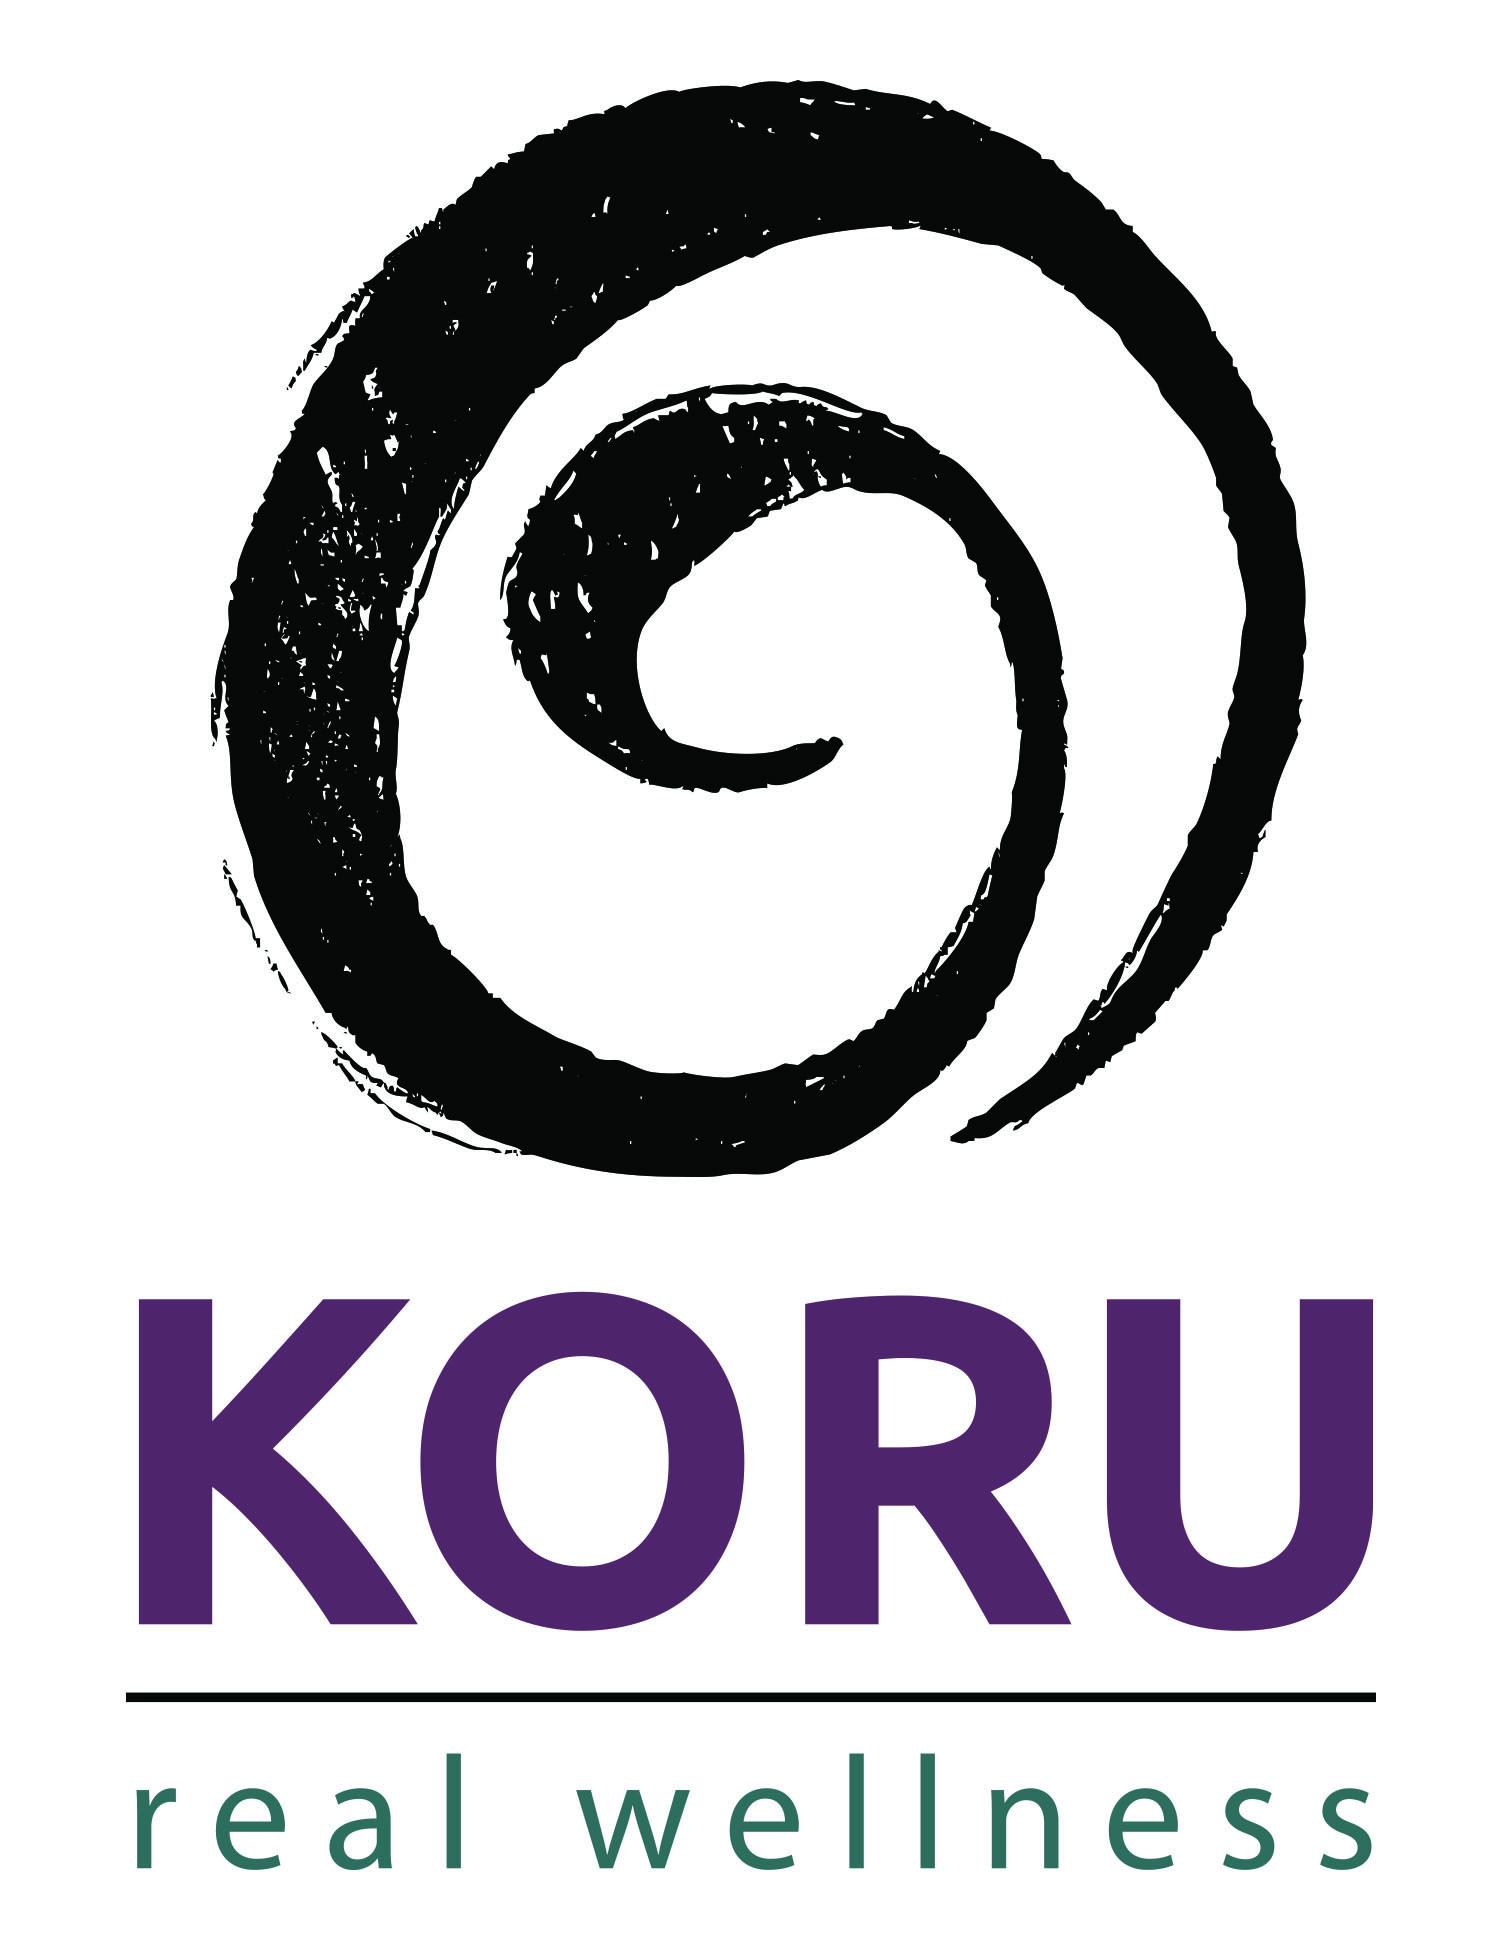 KORU real wellness logo